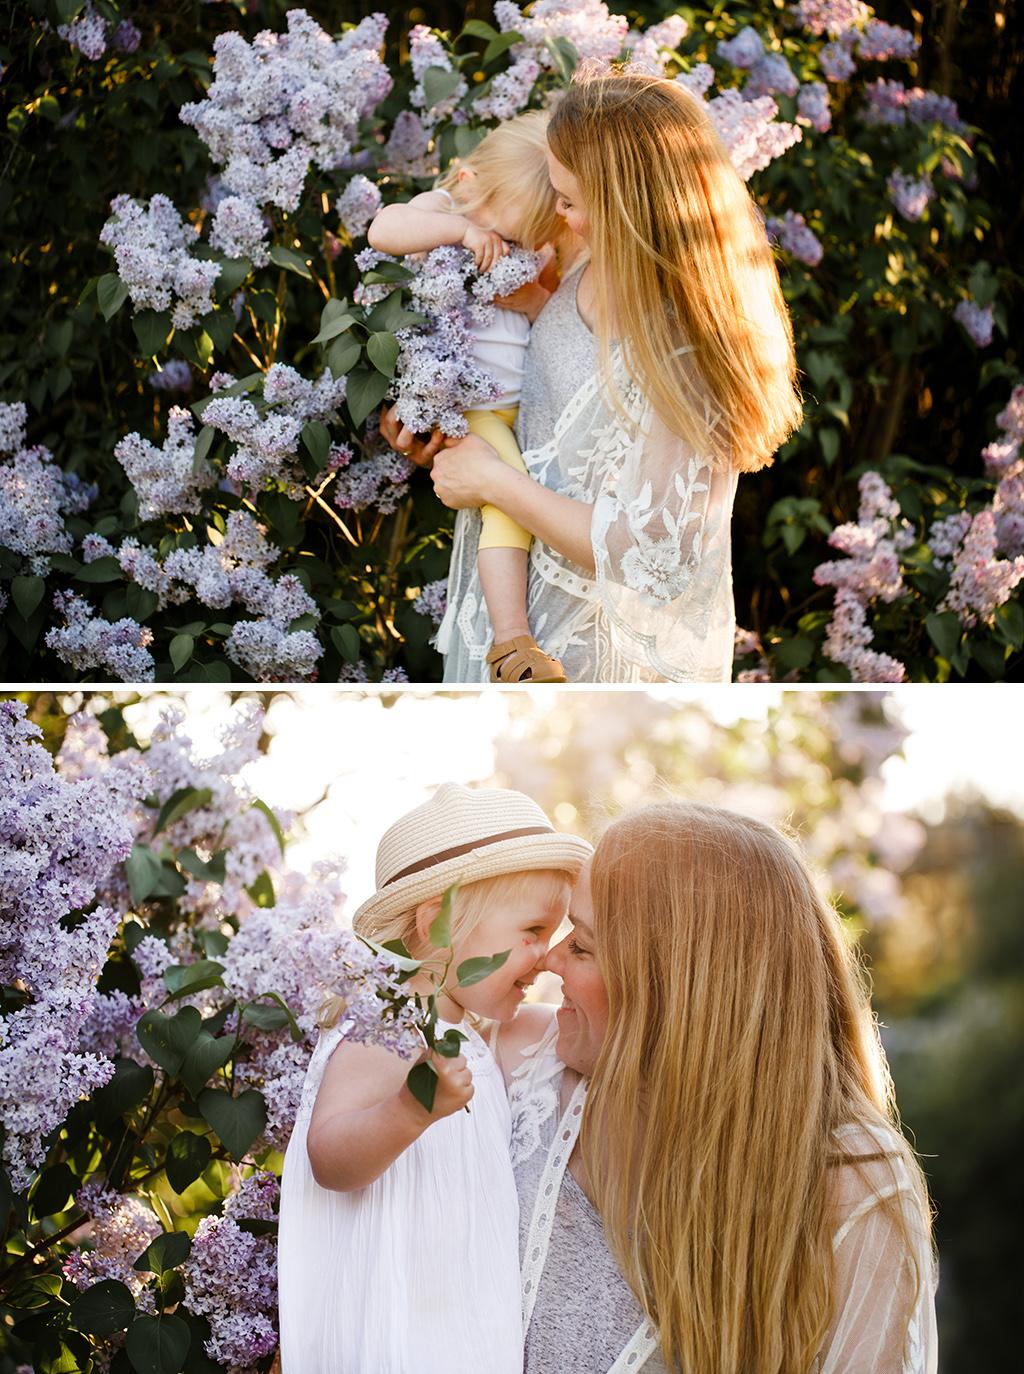 Familjefotograf_Stockholm_Syrener_familjefotografering_3.jpg